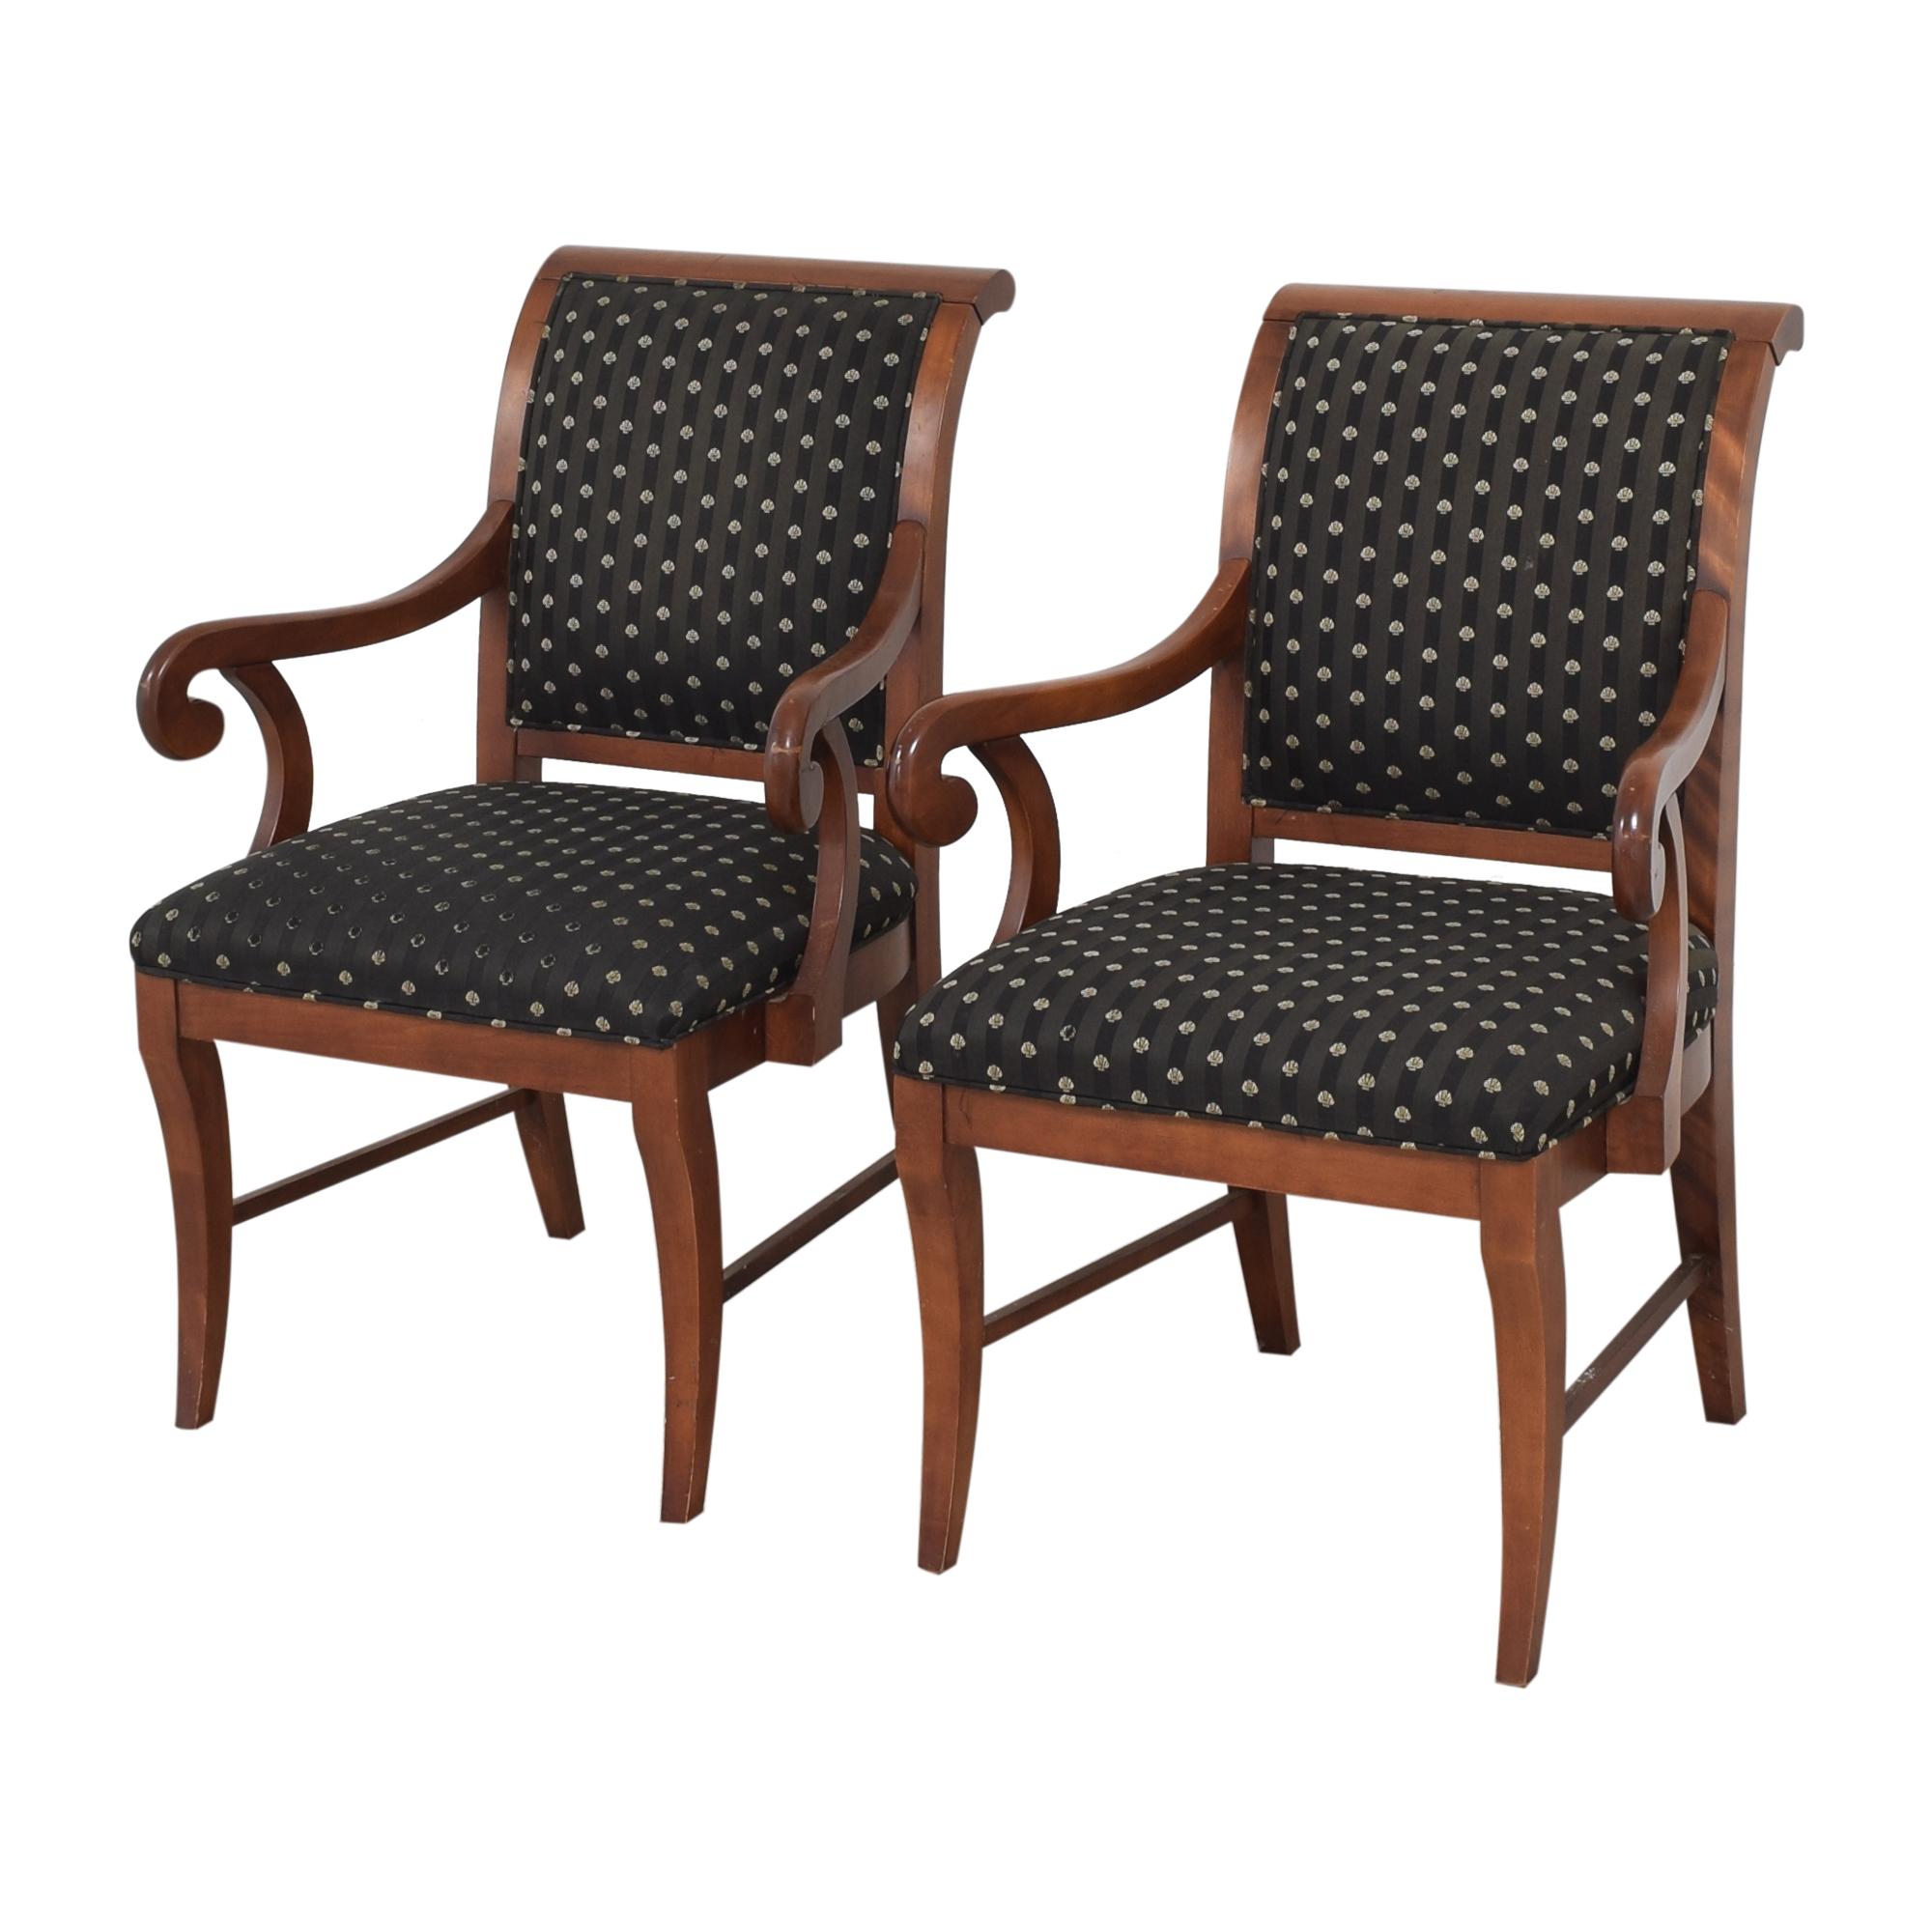 Leda Furniture Leda Furniture Arm Chairs